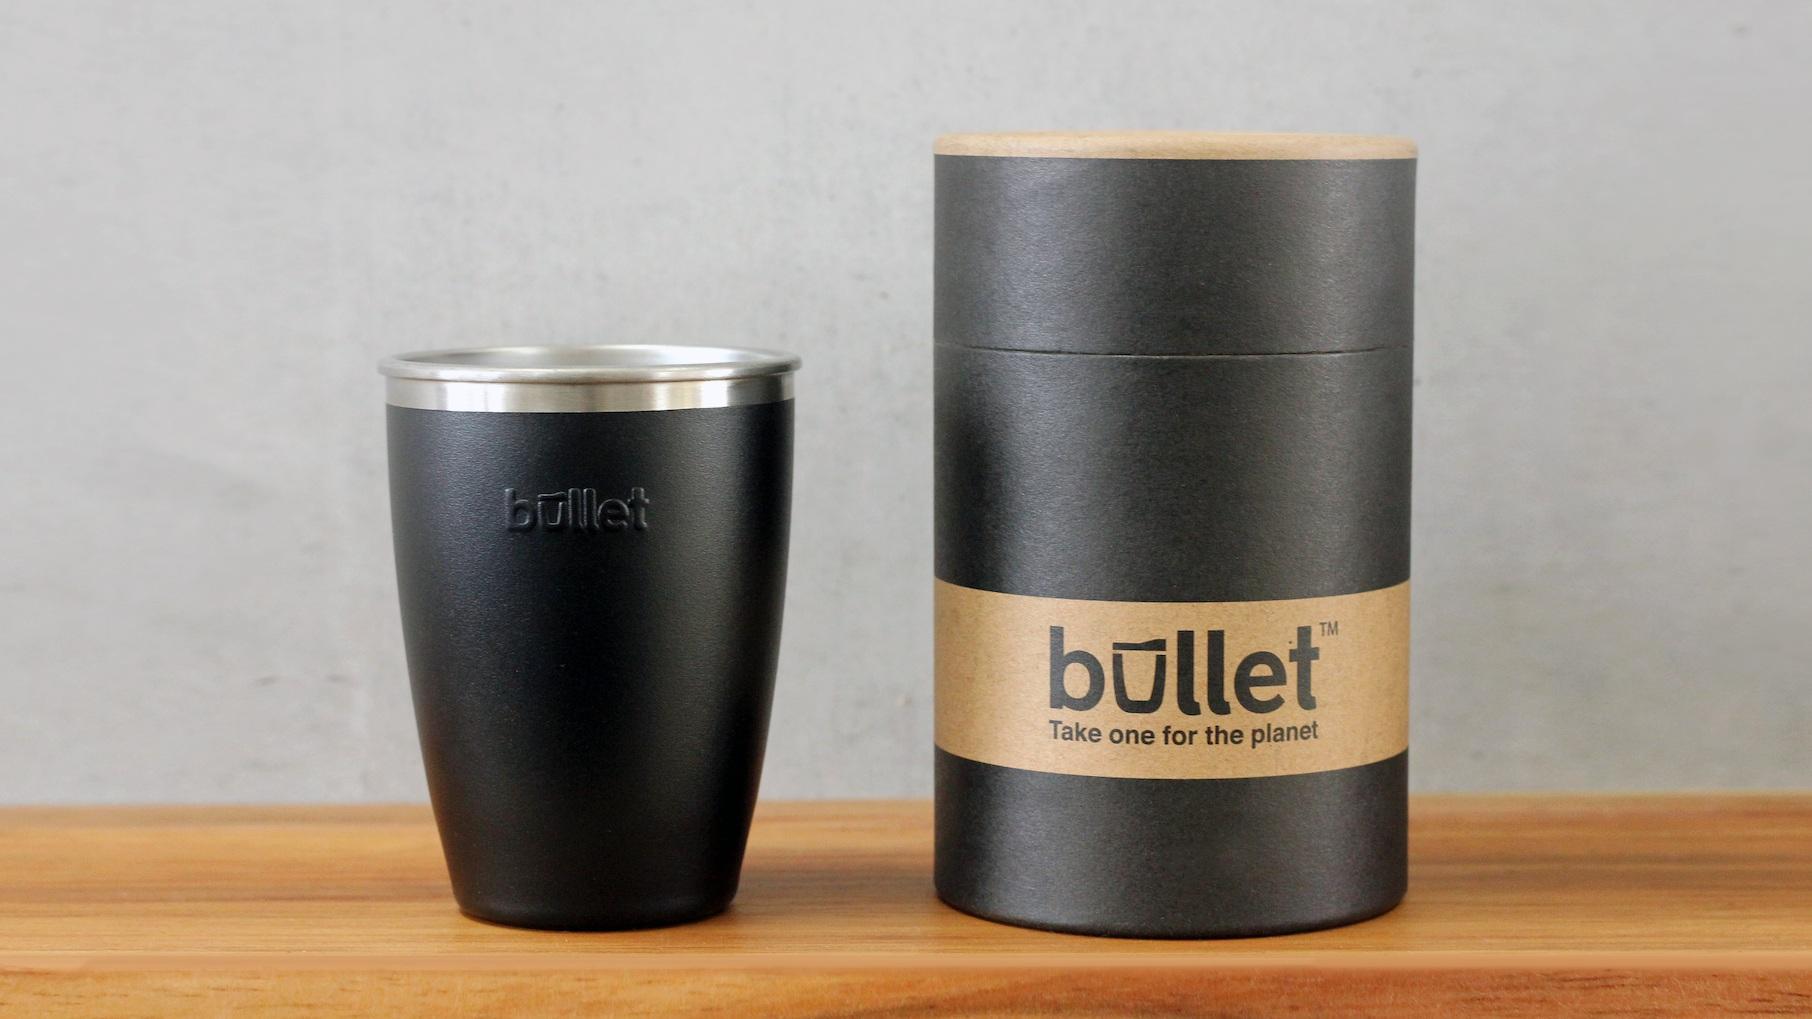 bullet-cover-copy.jpg